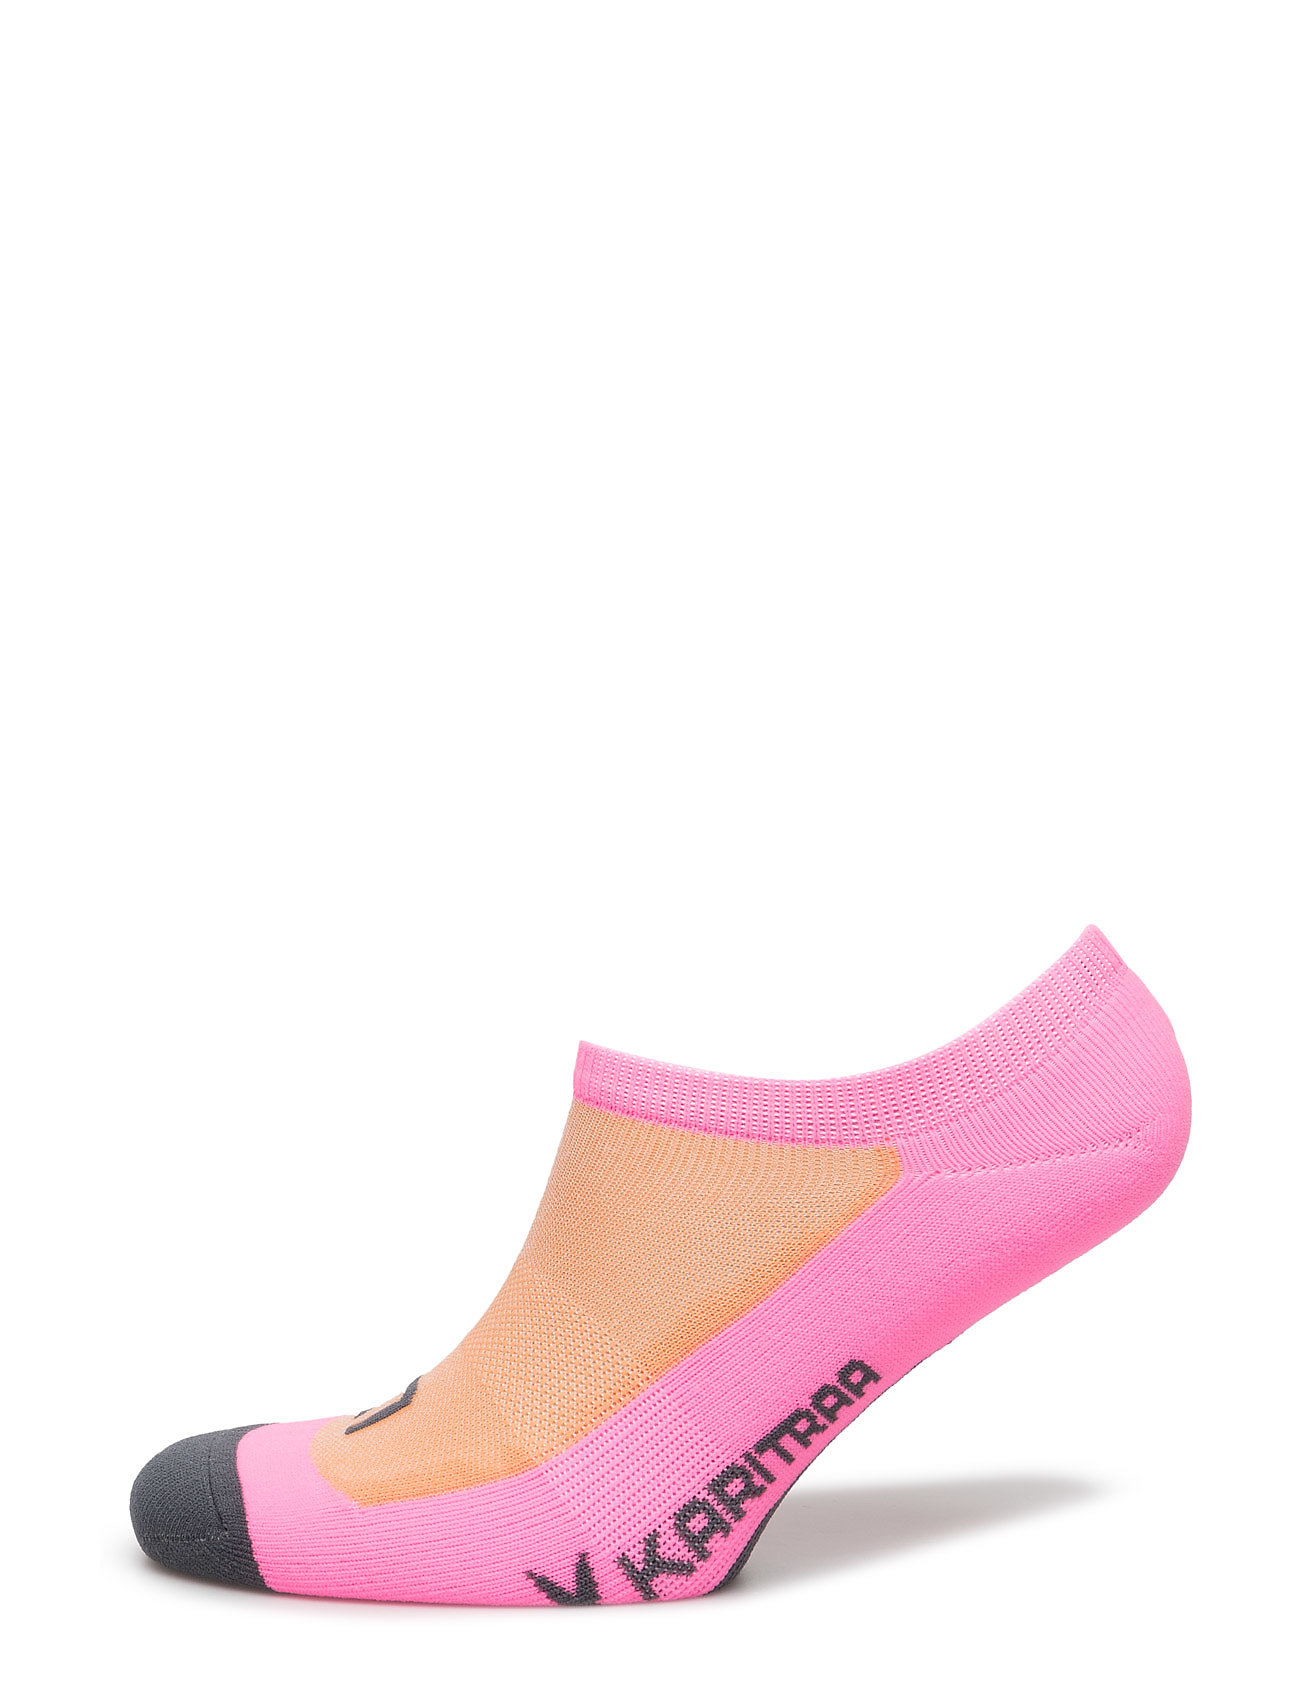 Lillet≈ Sock Kari Traa Sports undertøj til Damer i